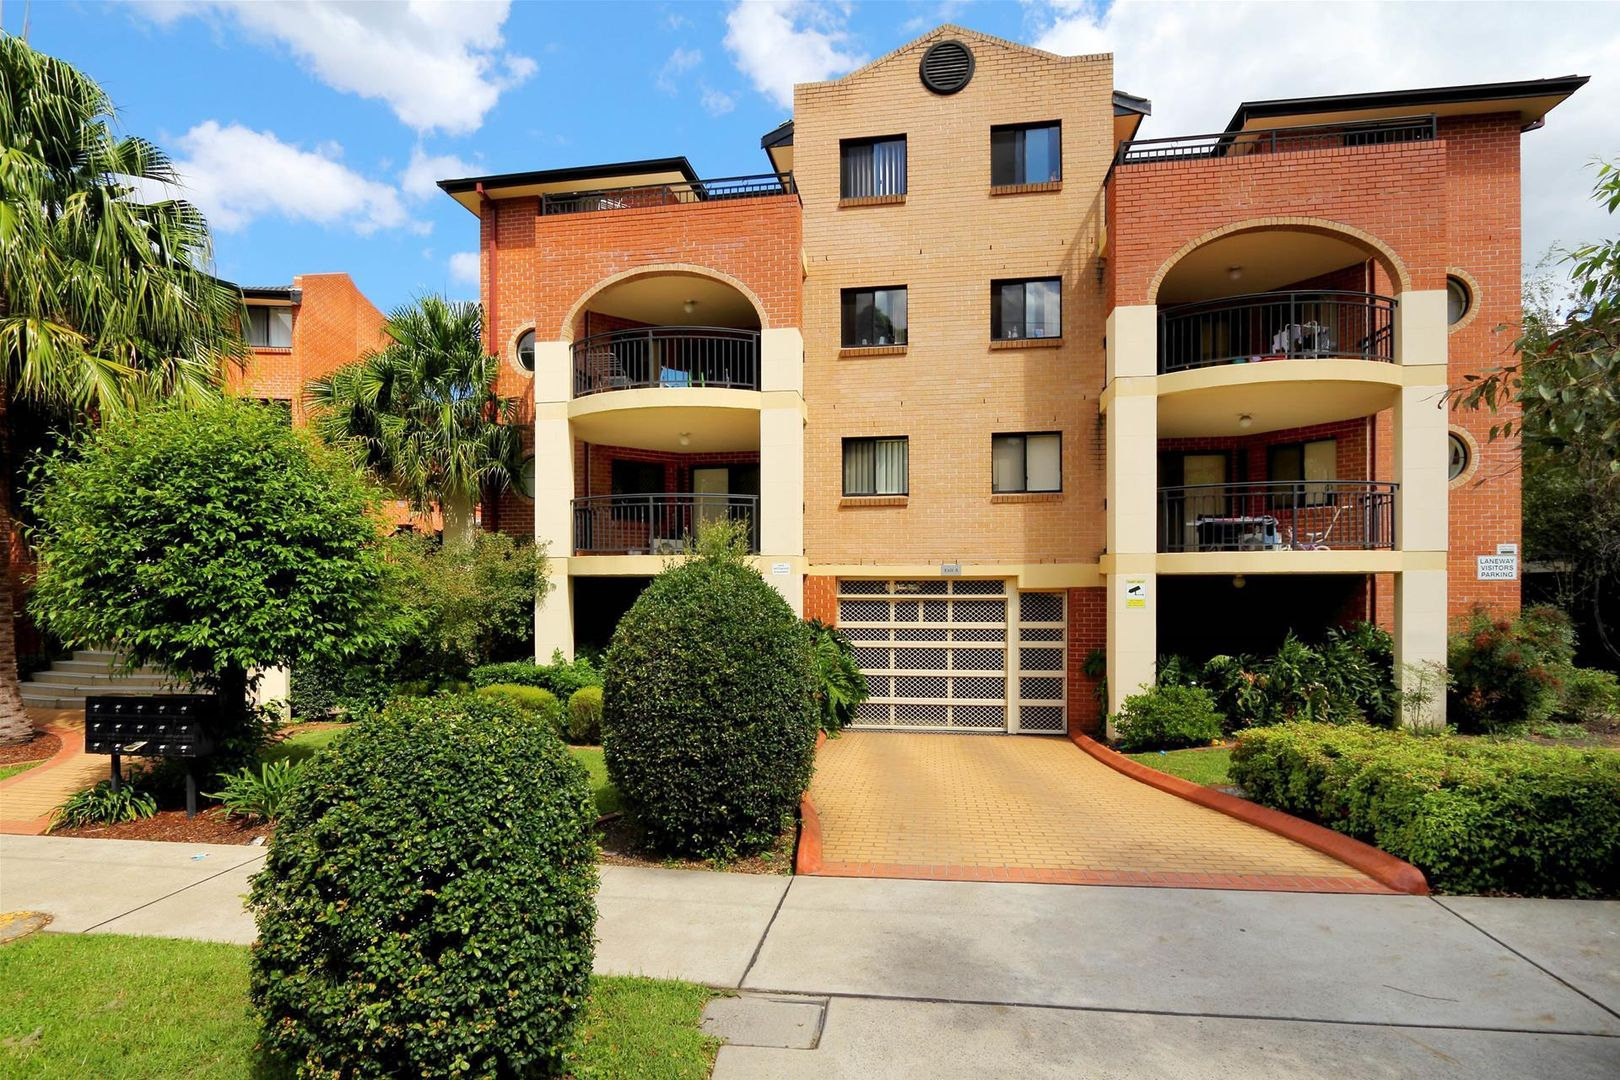 29/1-7 Belmore Street, North Parramatta NSW 2151, Image 0